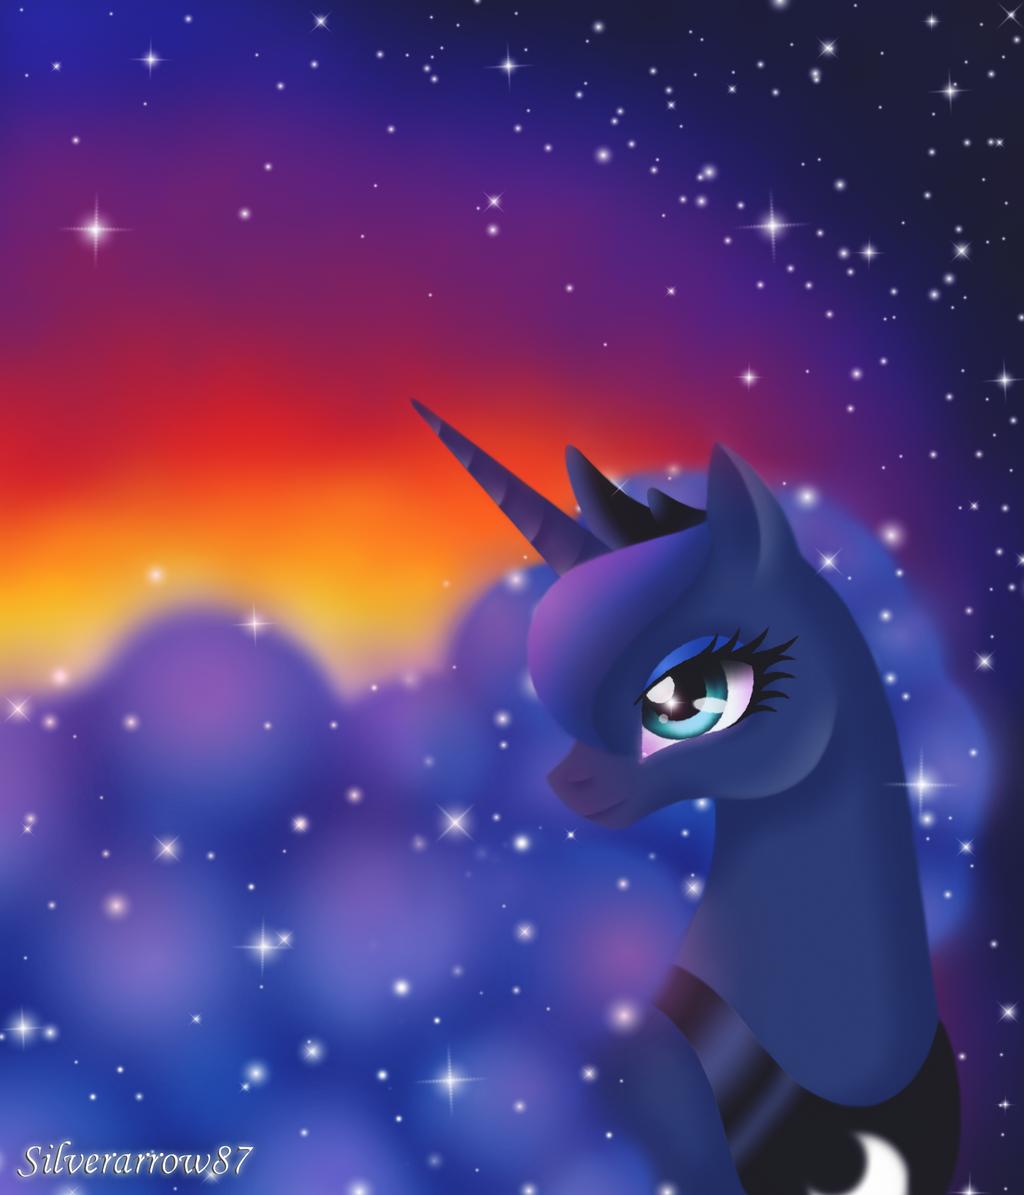 Luna's sunrise by Silverarrow87